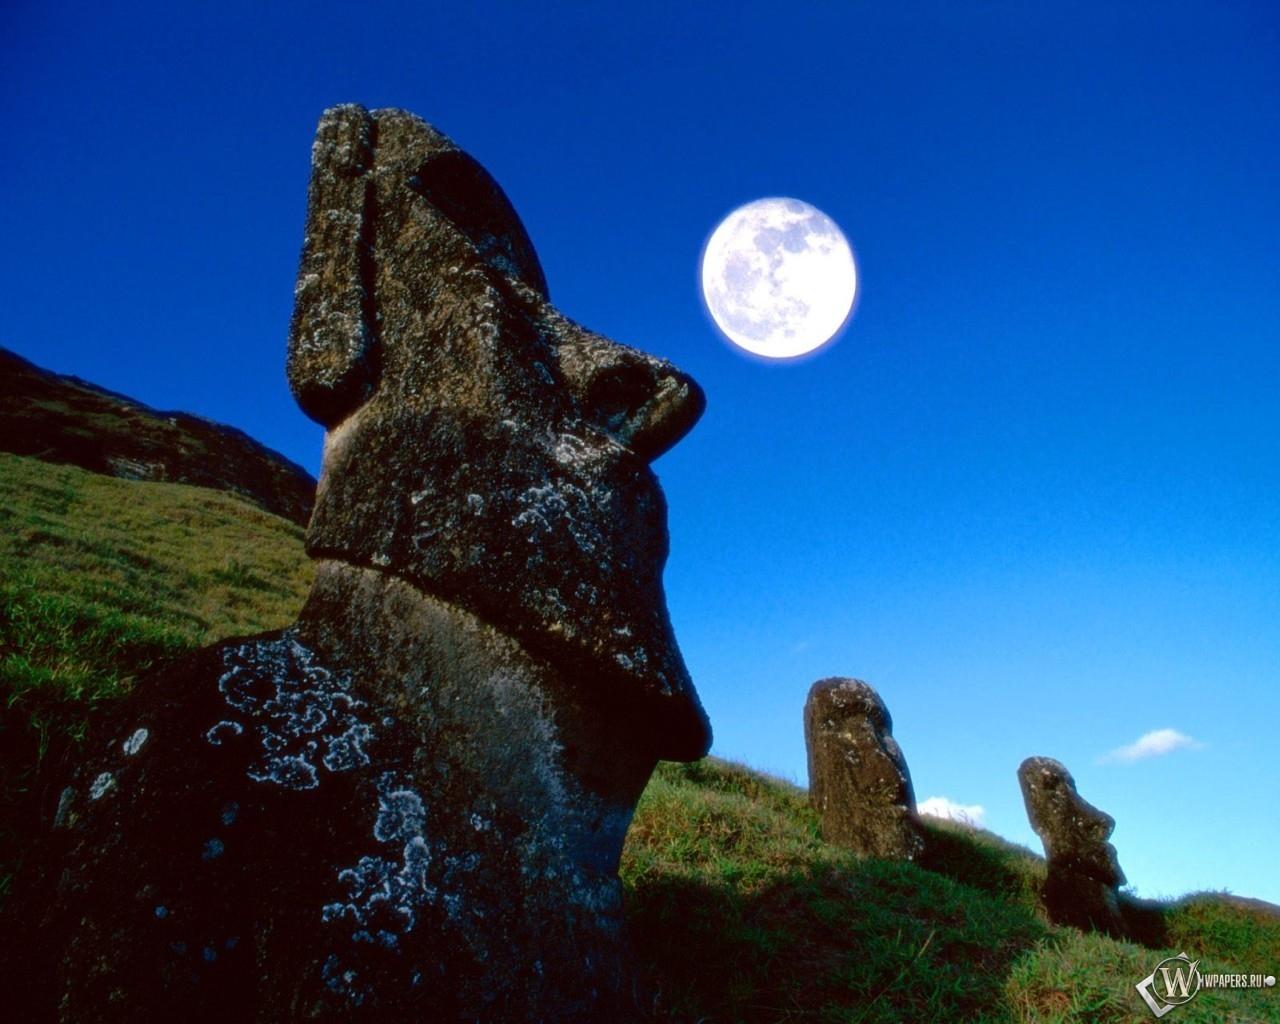 Moa Rano Raraku Easter Island Chile 1280x1024